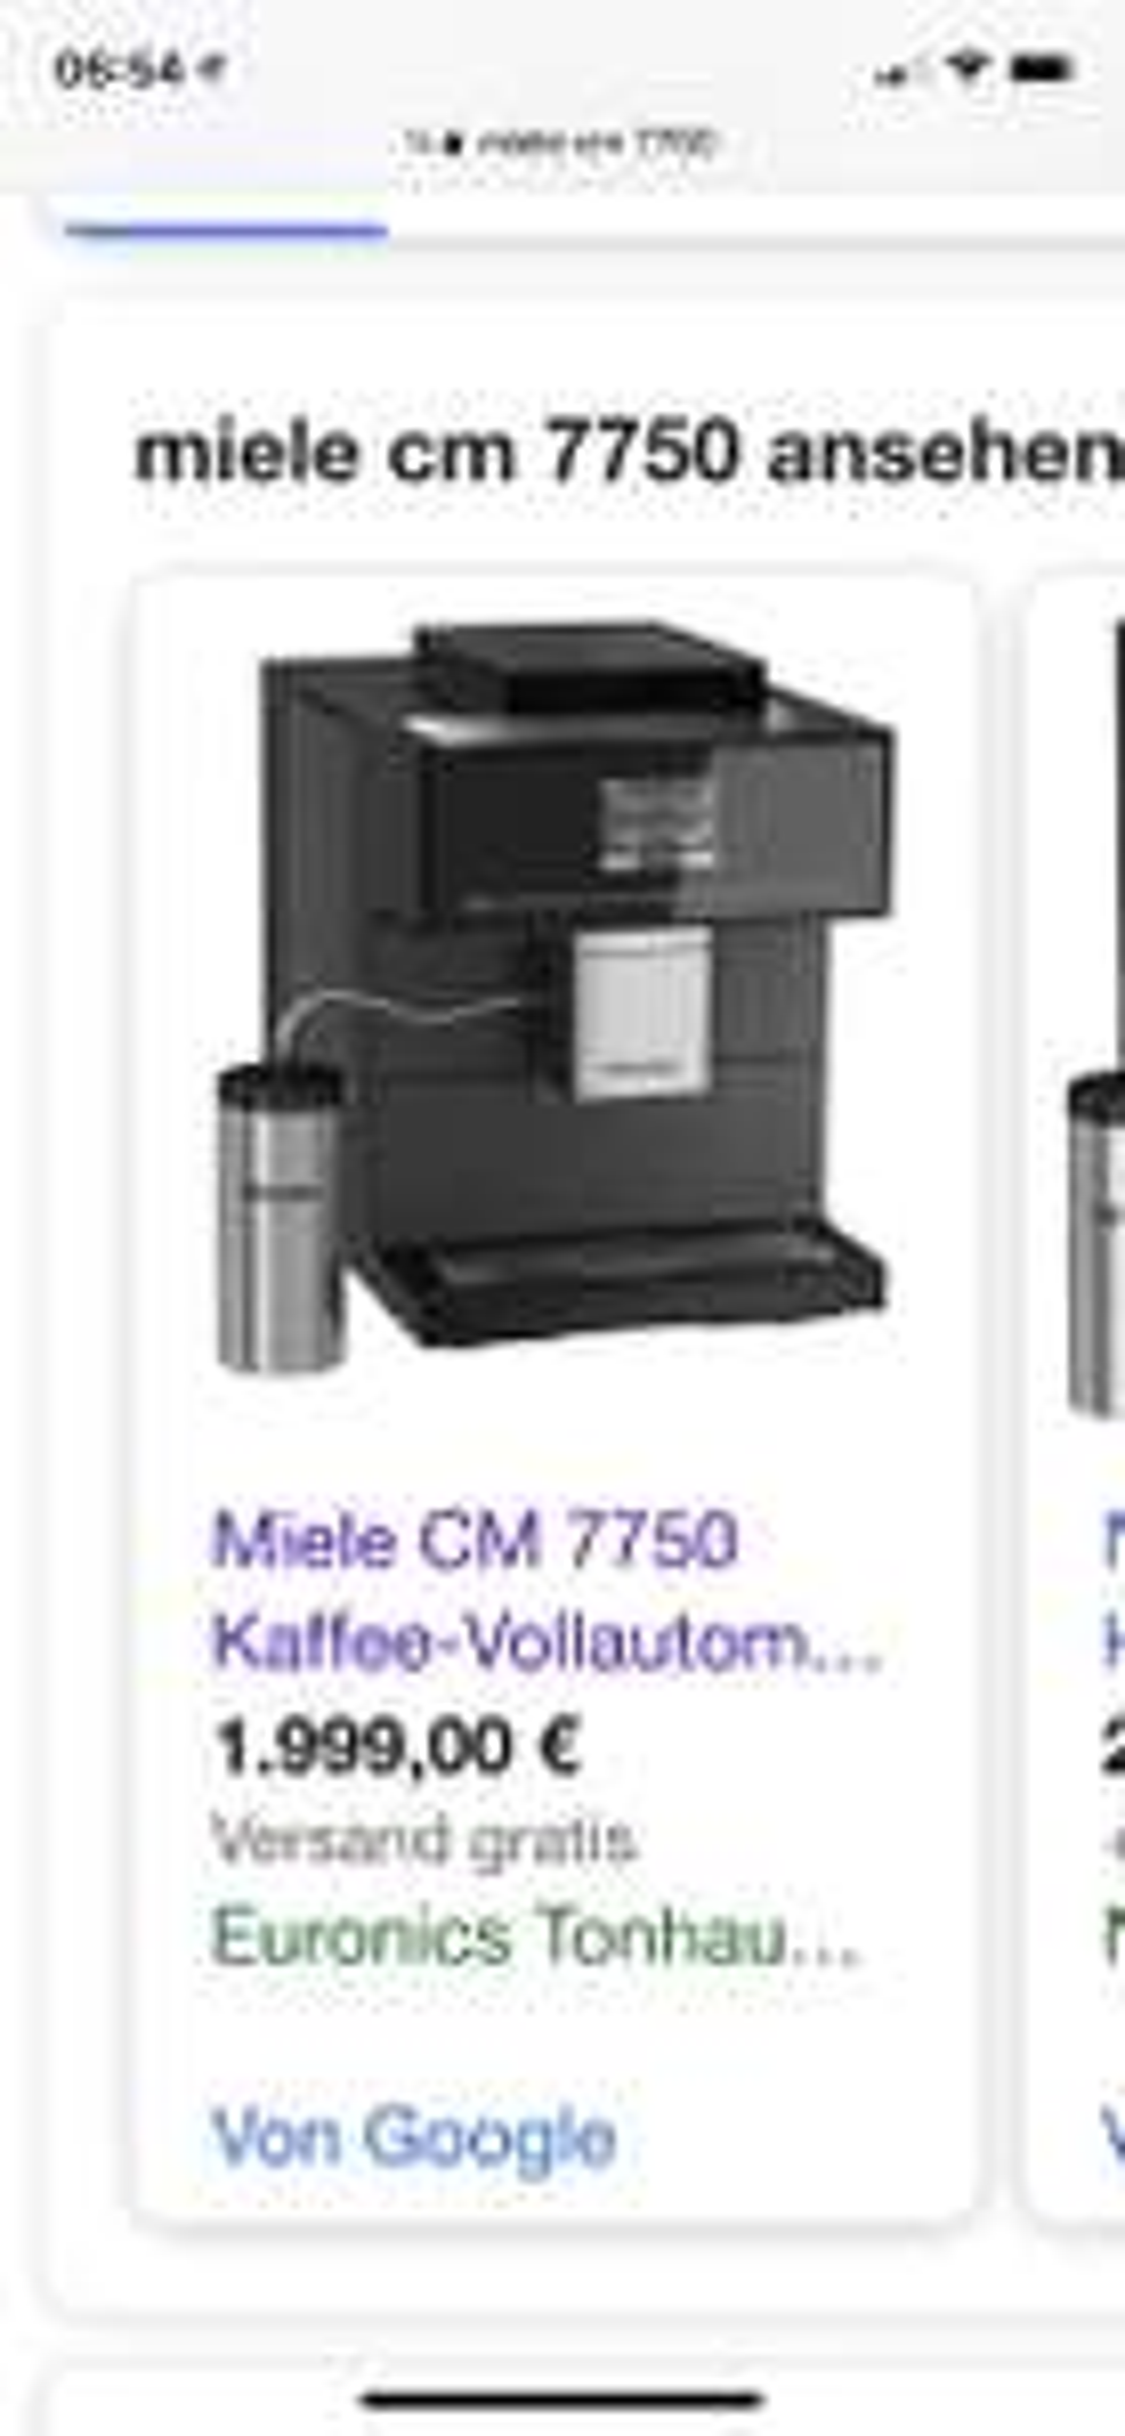 Miele CM 7750 Vollautomat zum Guten Preis